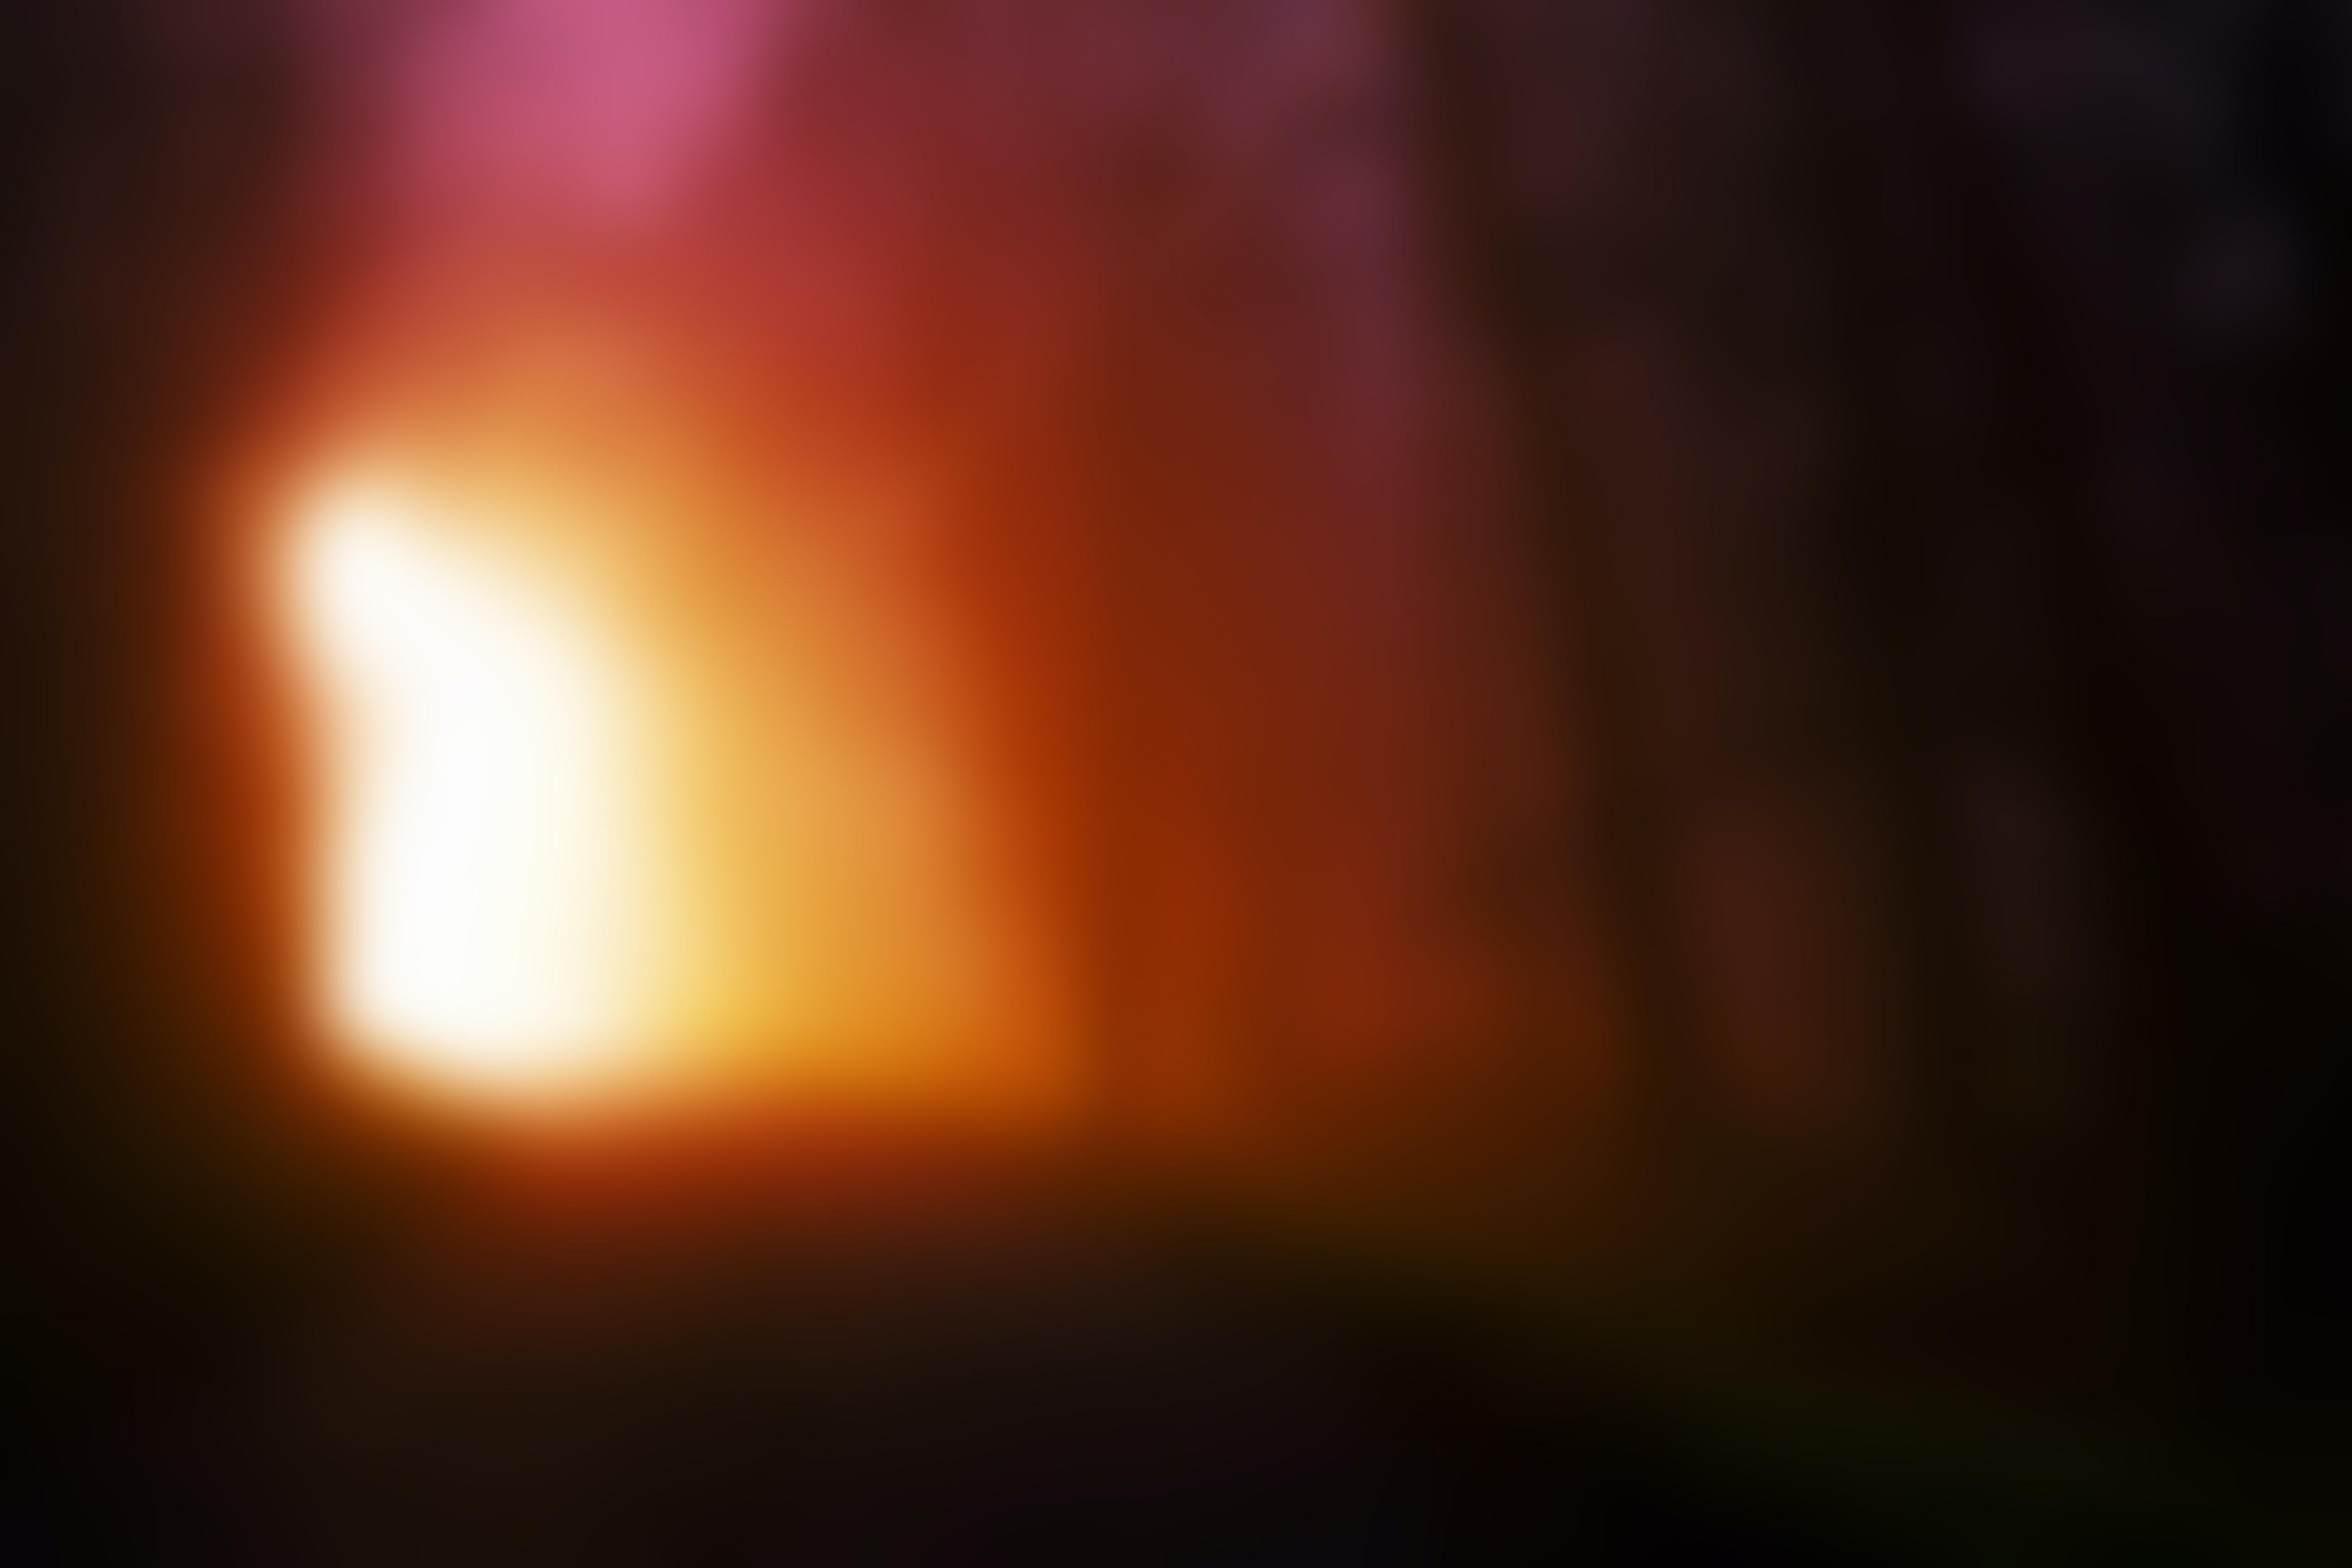 1000 amazing light background photos pexels free stock photos